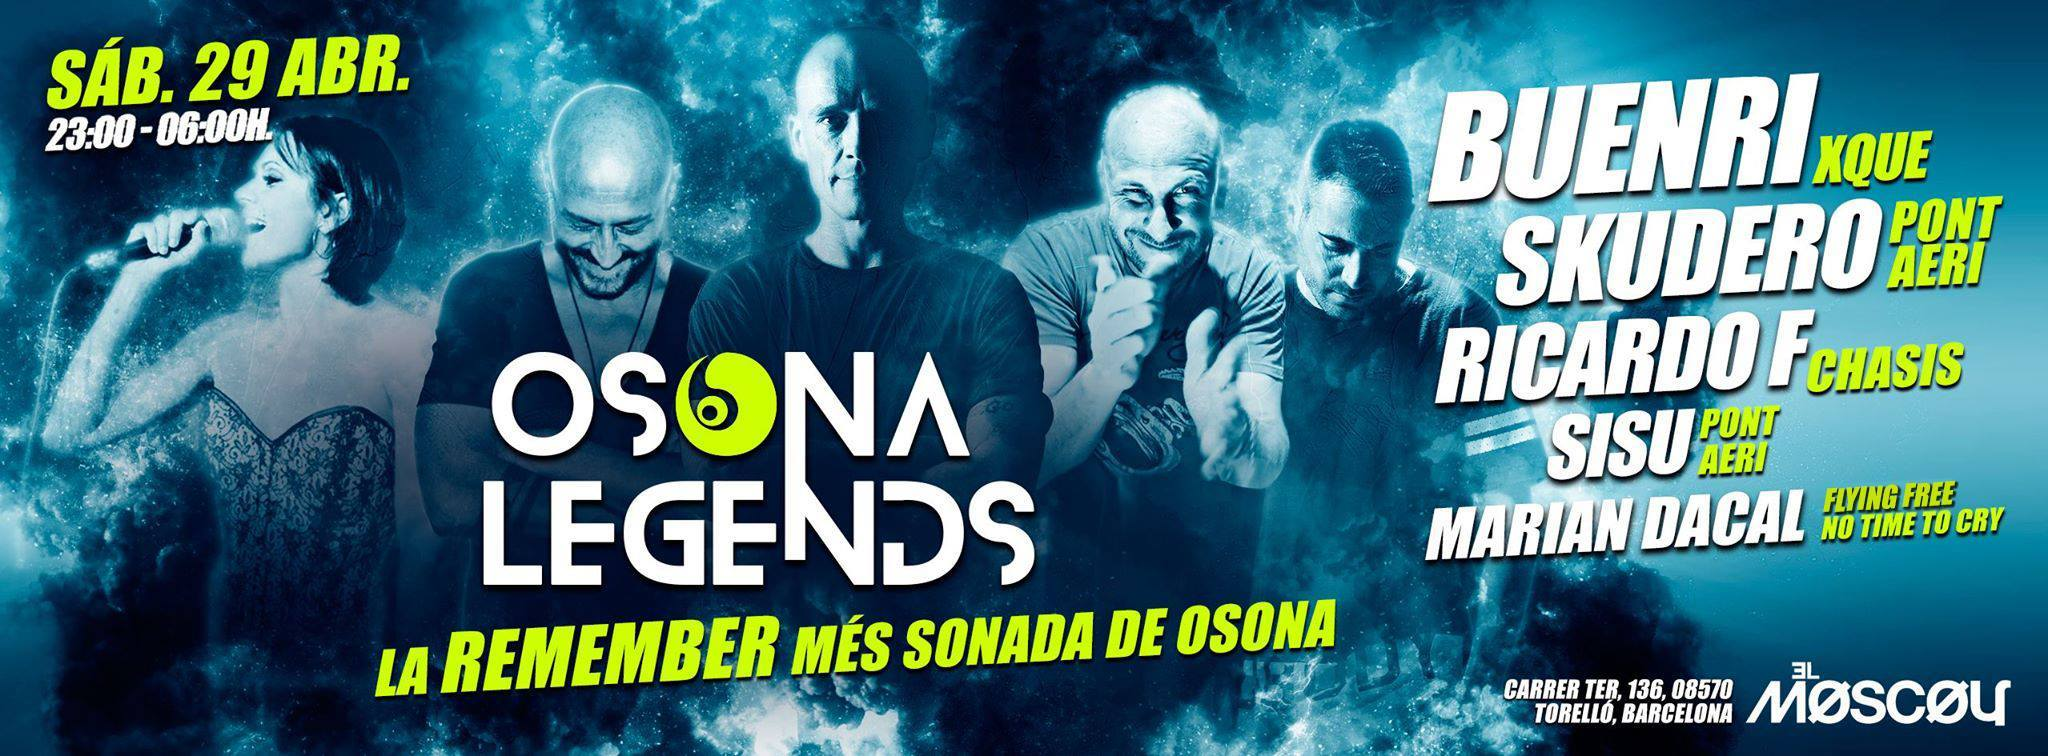 Osona Legends